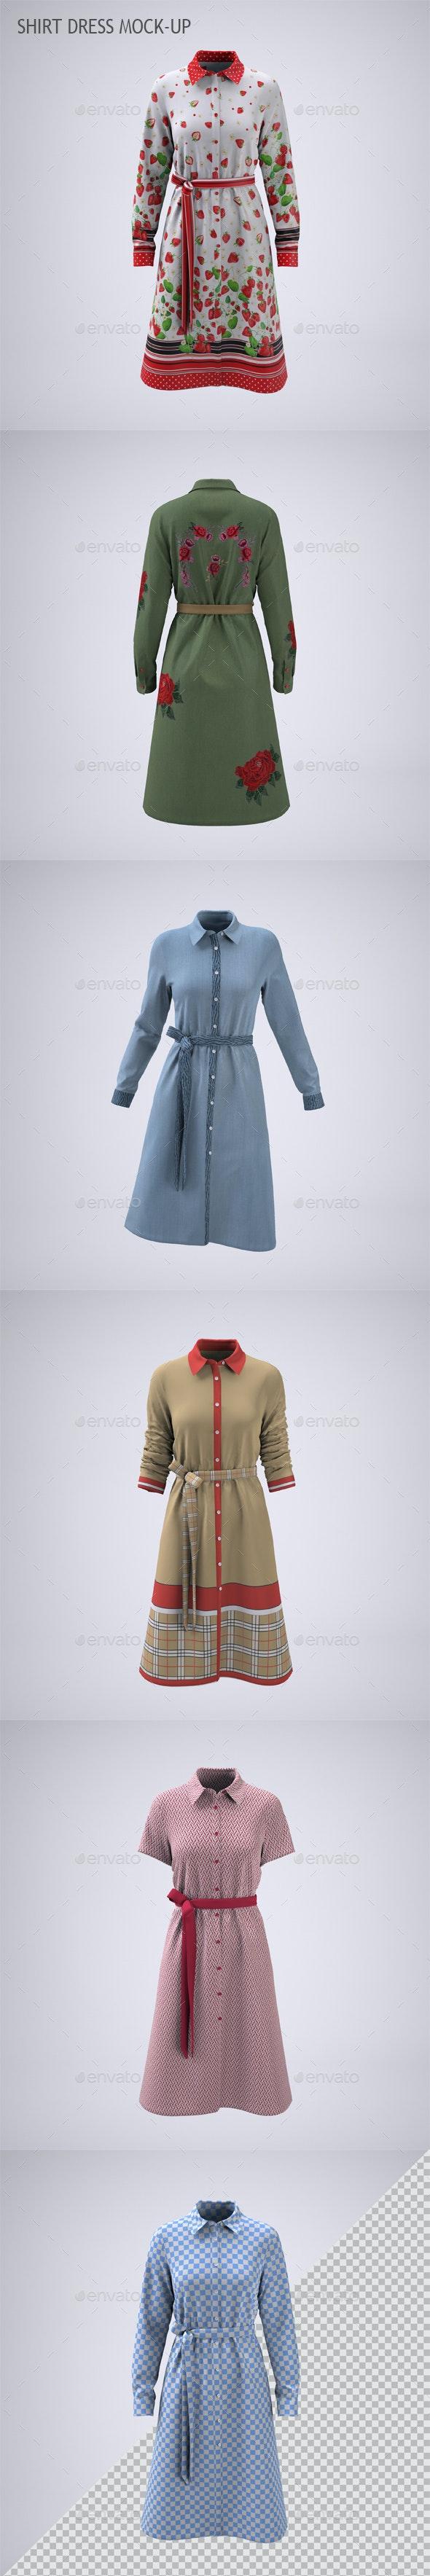 Shirt Dress Mock-up - Apparel Product Mock-Ups